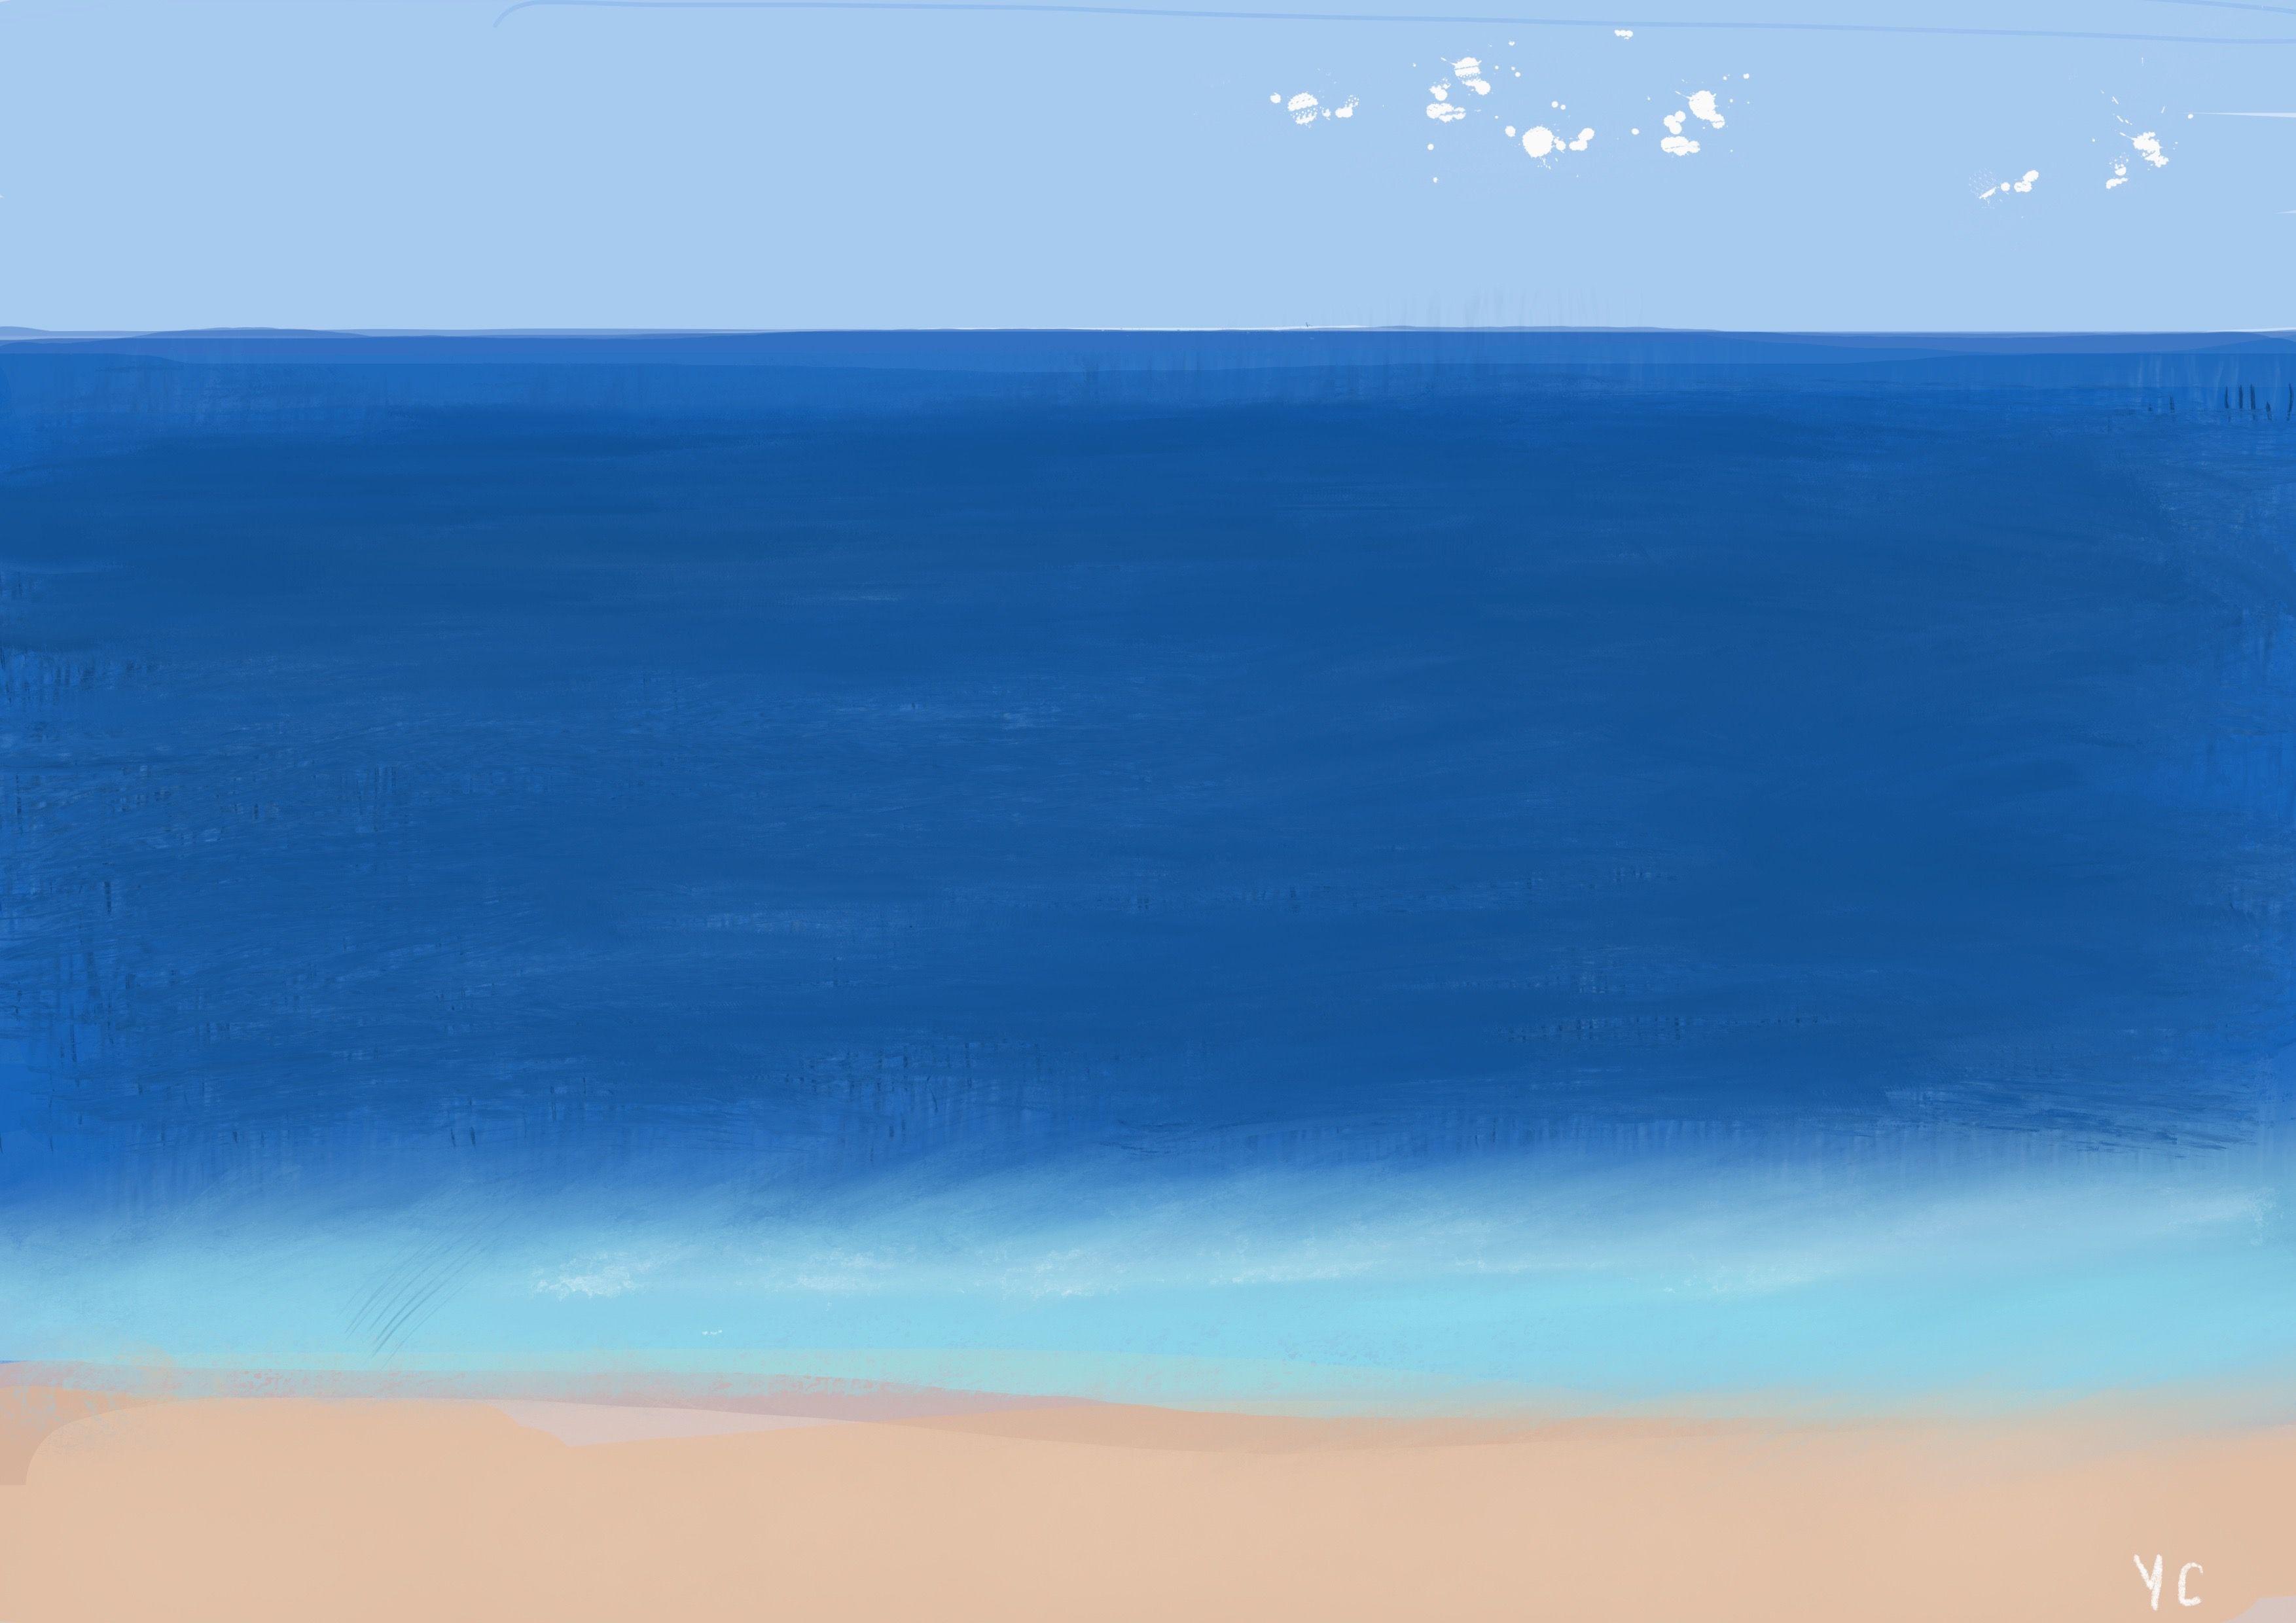 Mit Procreate Pencil Und Fingerspitze Das Meer Yuksel Cavlak Germany Spitze Finger